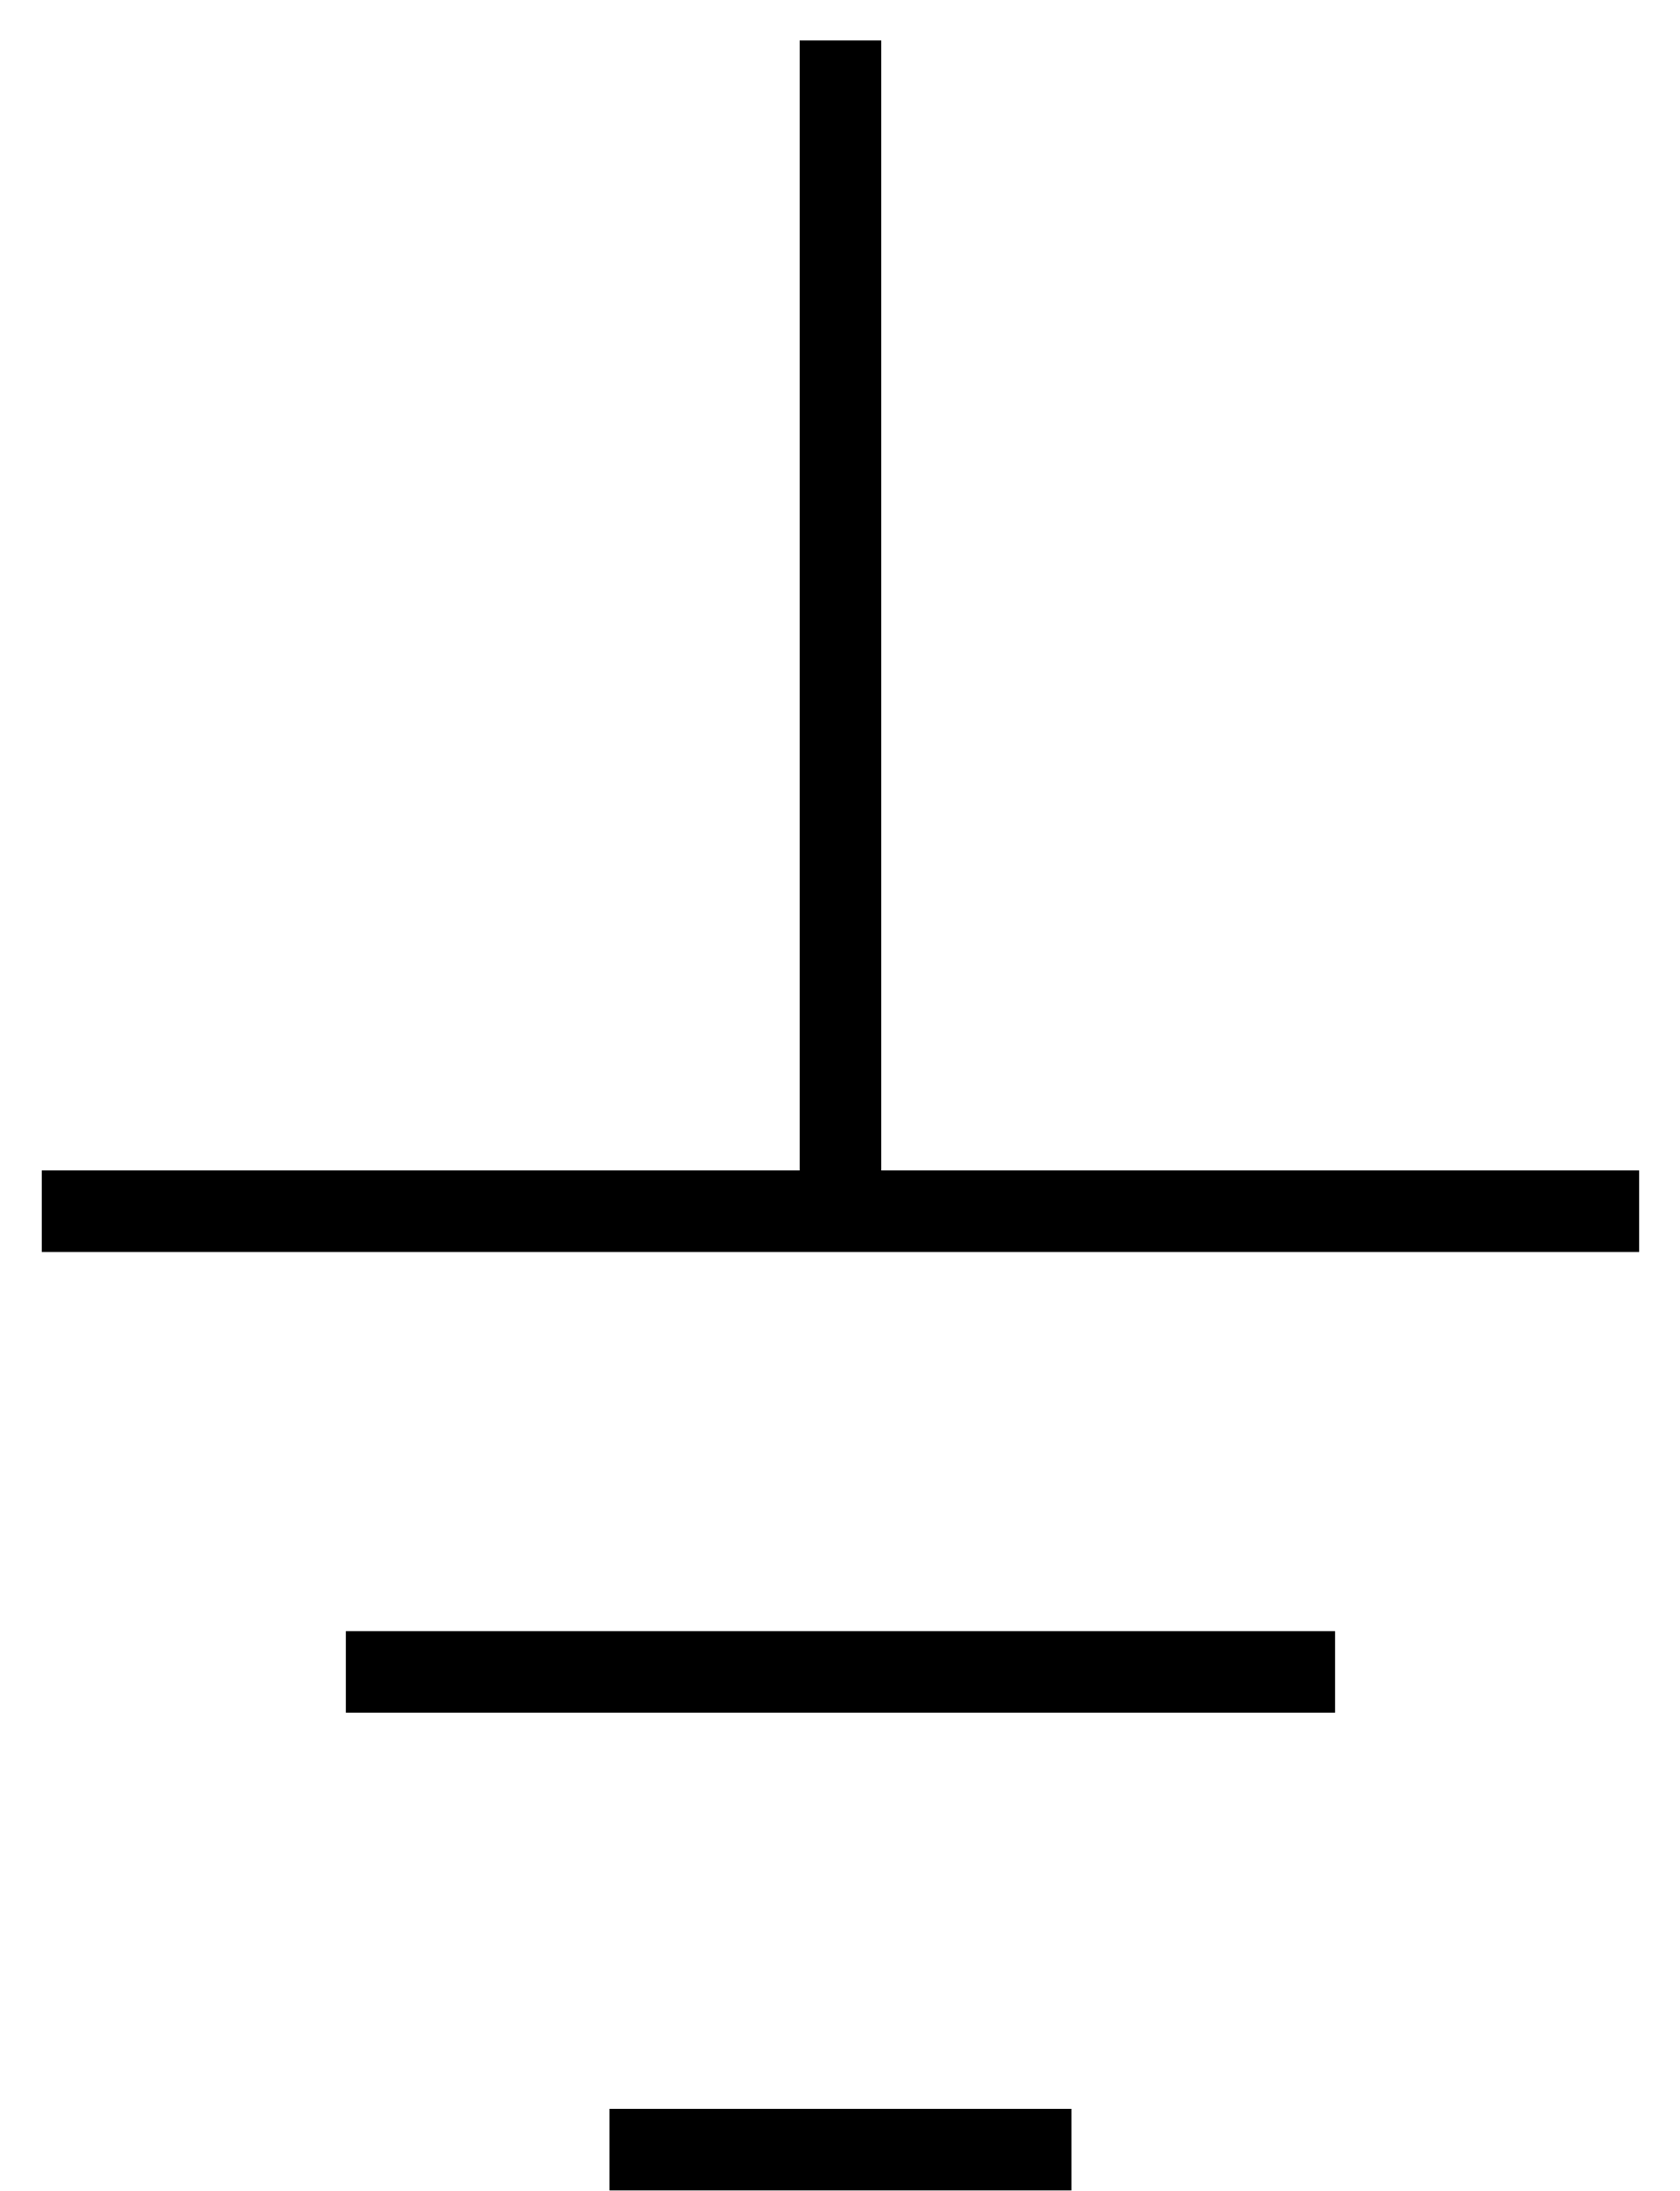 Clipart RSA IEC Ground Symbol